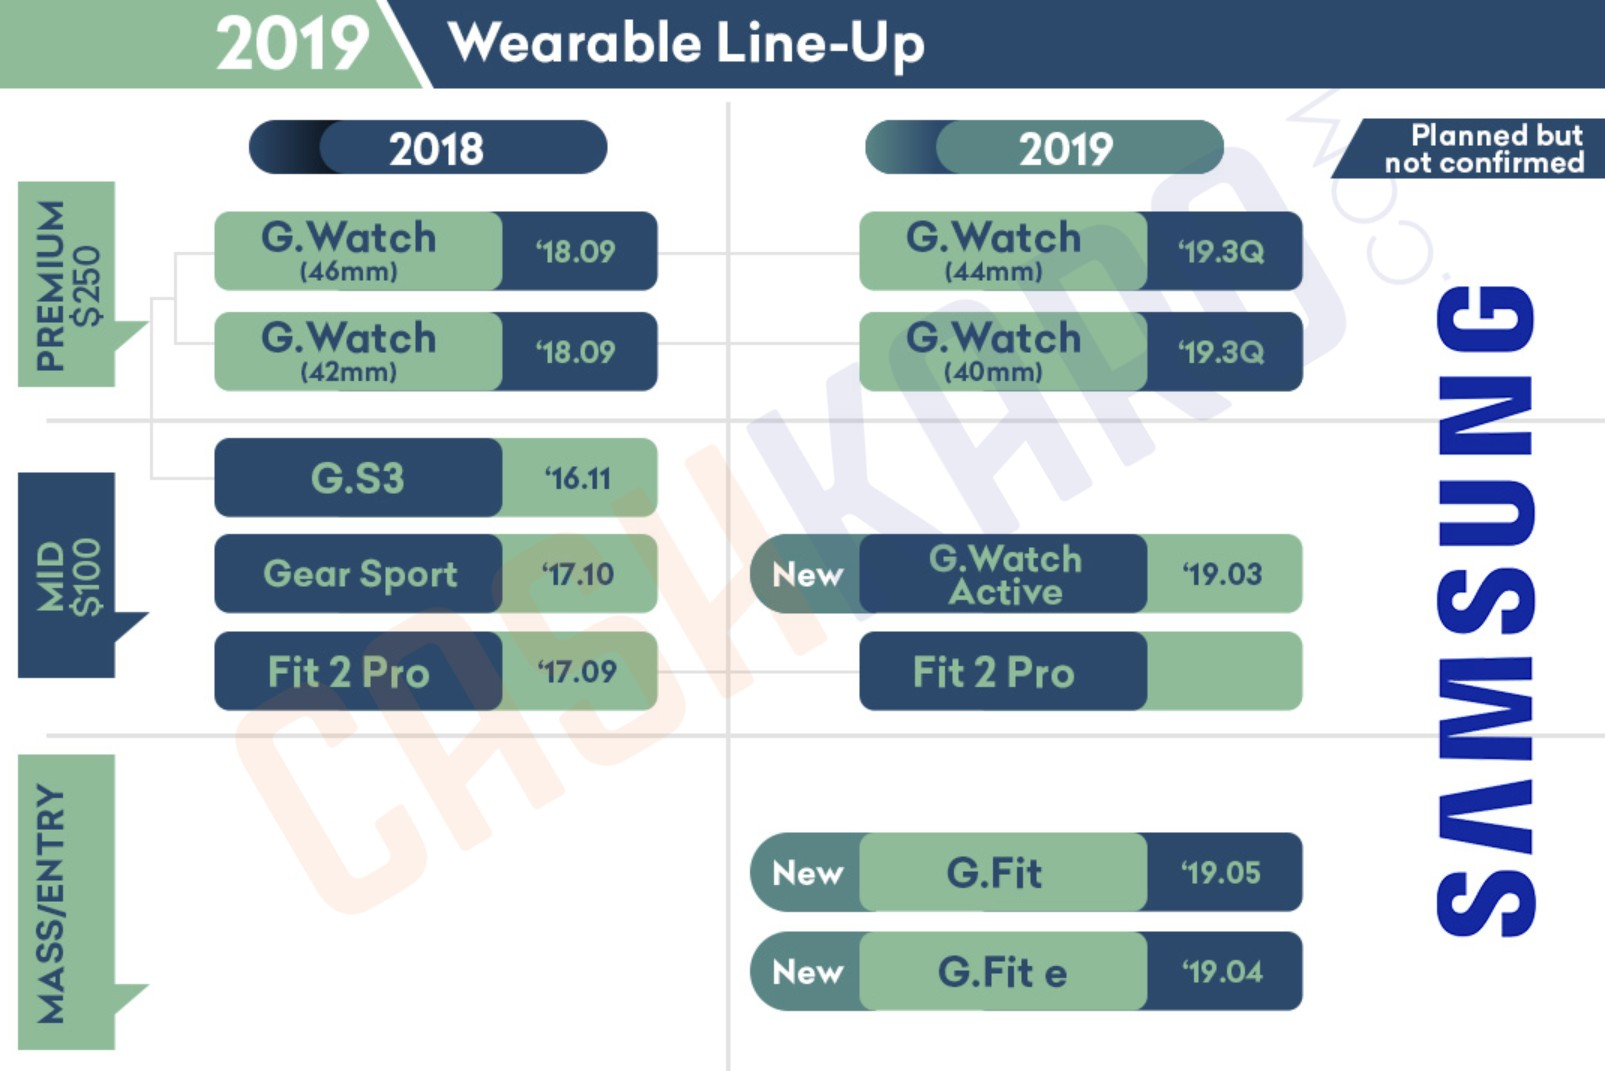 Samsung Wearable Lineup